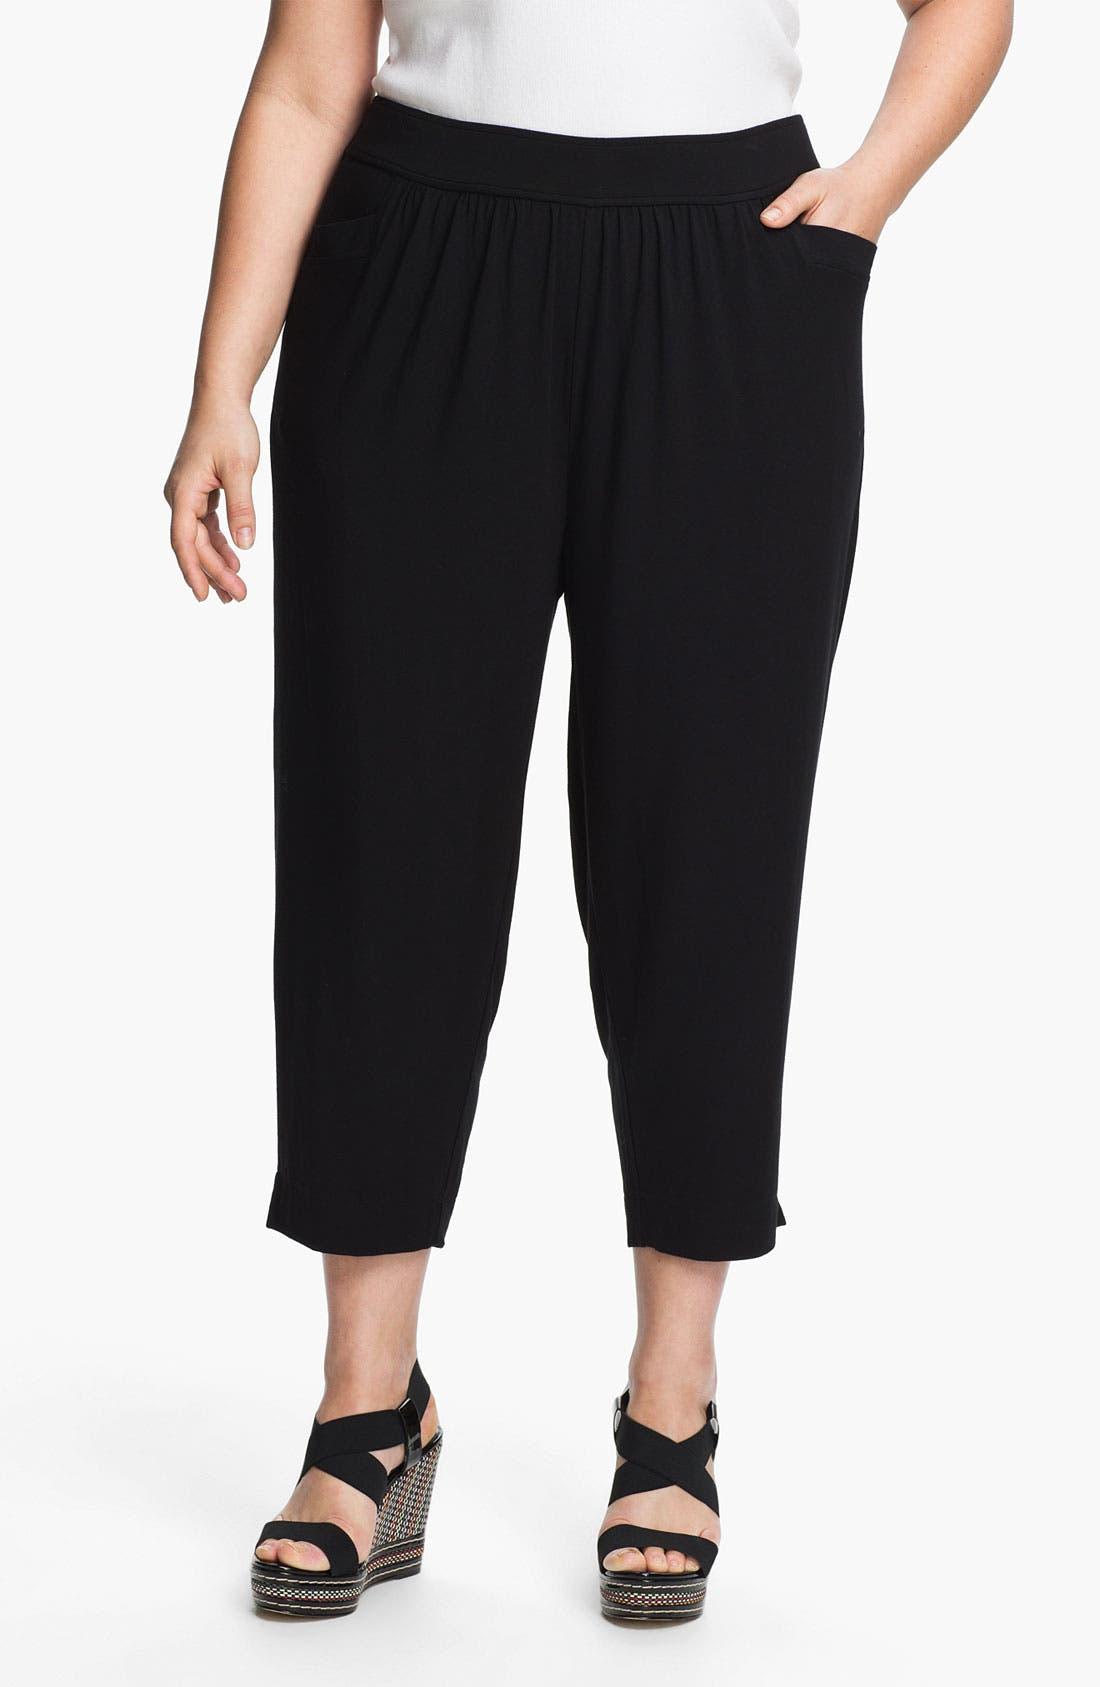 Alternate Image 1 Selected - Sejour Jersey Knit Crop Pants (Plus Size)